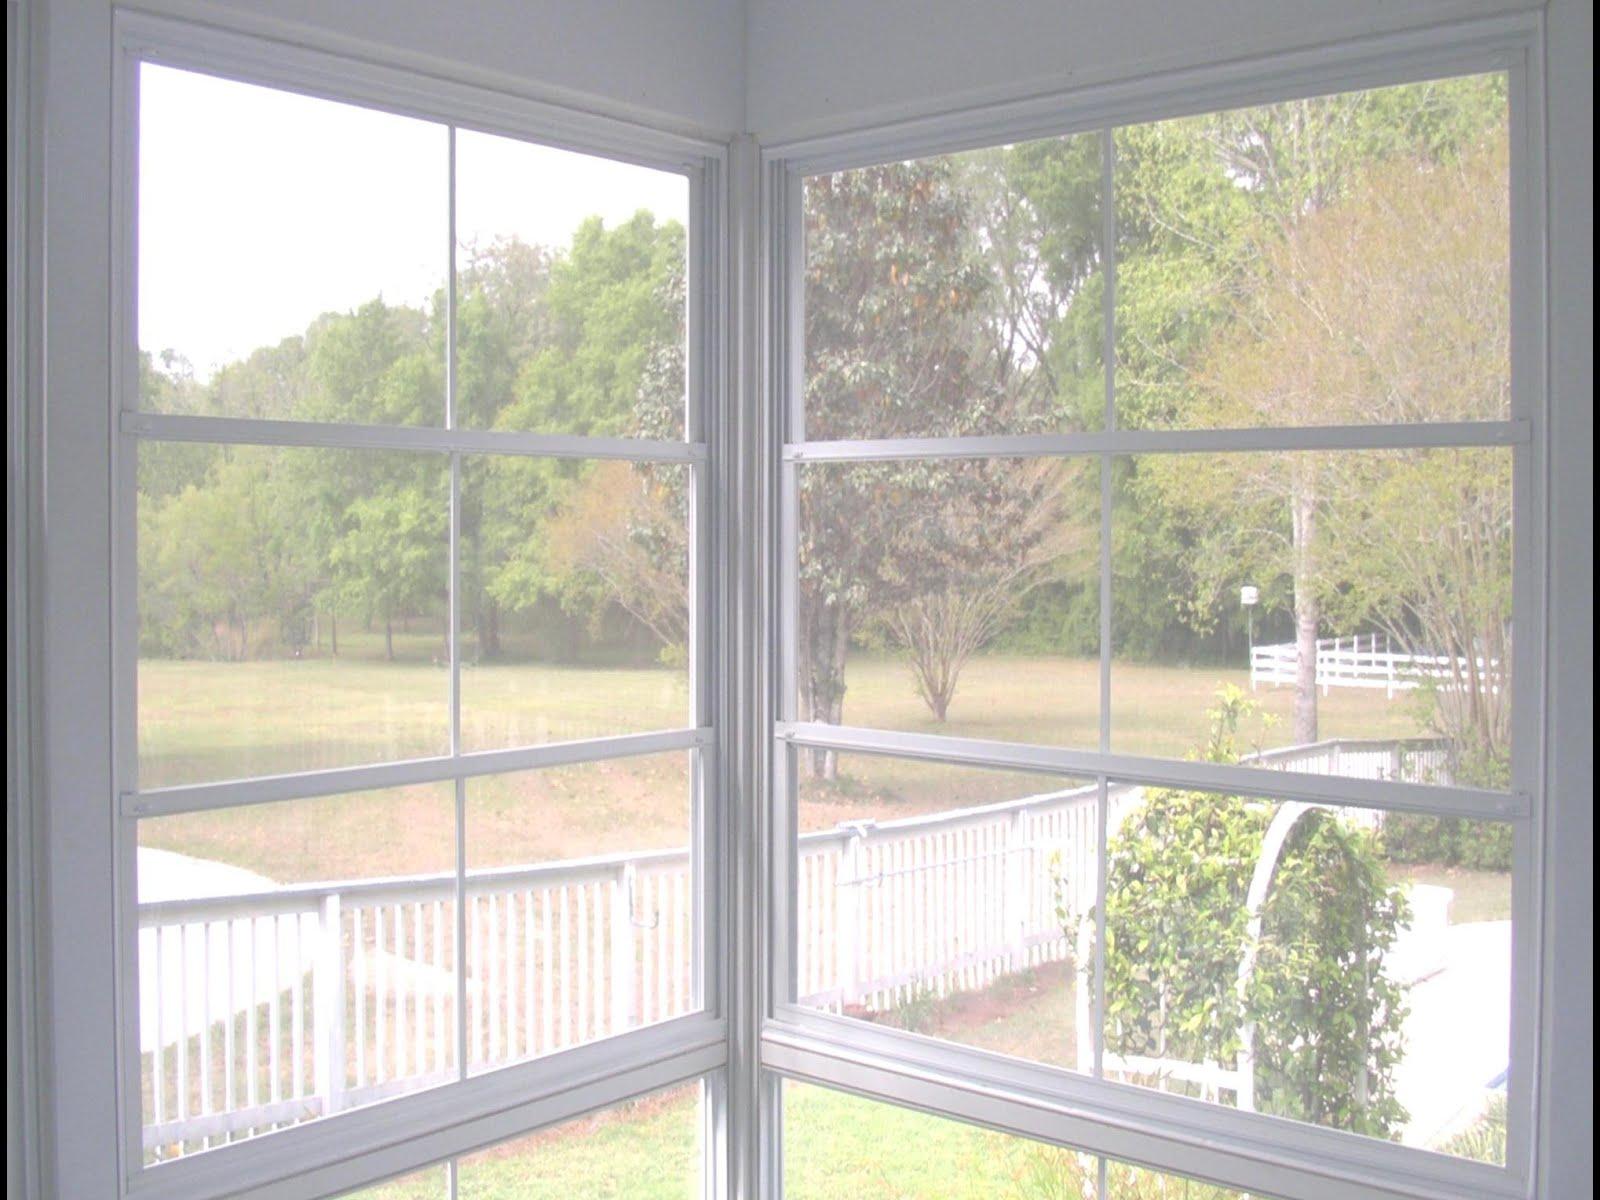 Vinyl Patio Windows : Pool enclosures usa vinyl pane patio windows